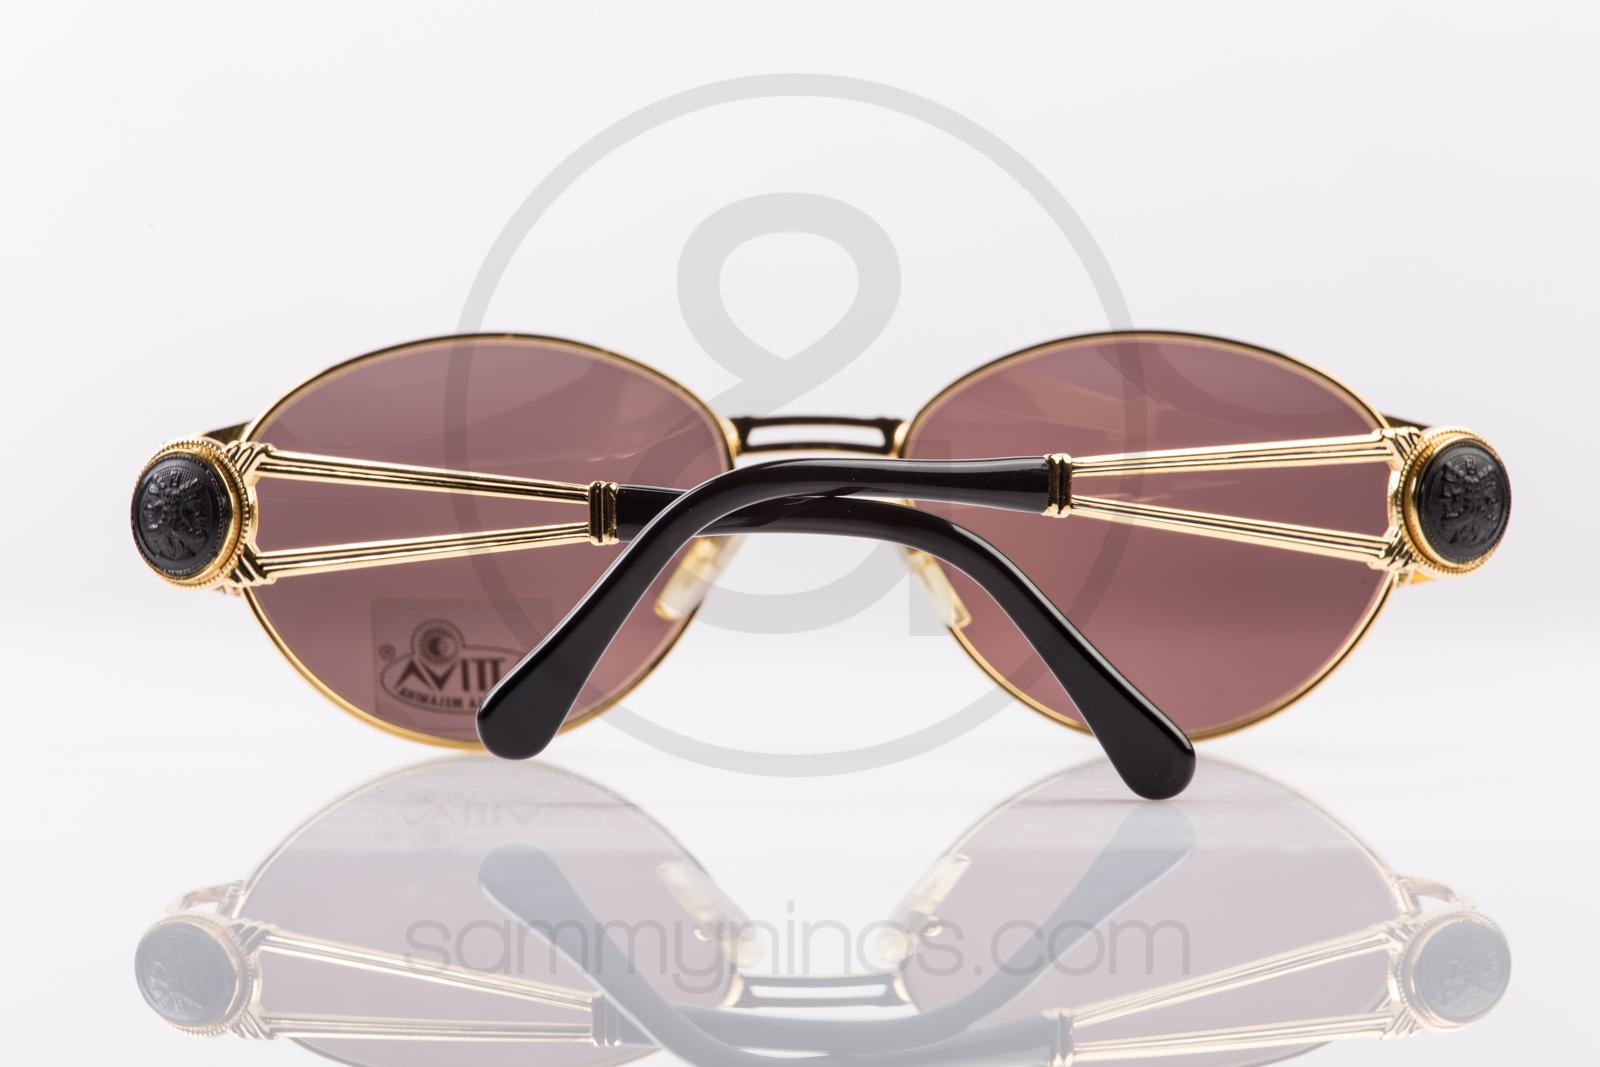 d8acce11b8f Vintage Fendi Sunglasses - Bitterroot Public Library